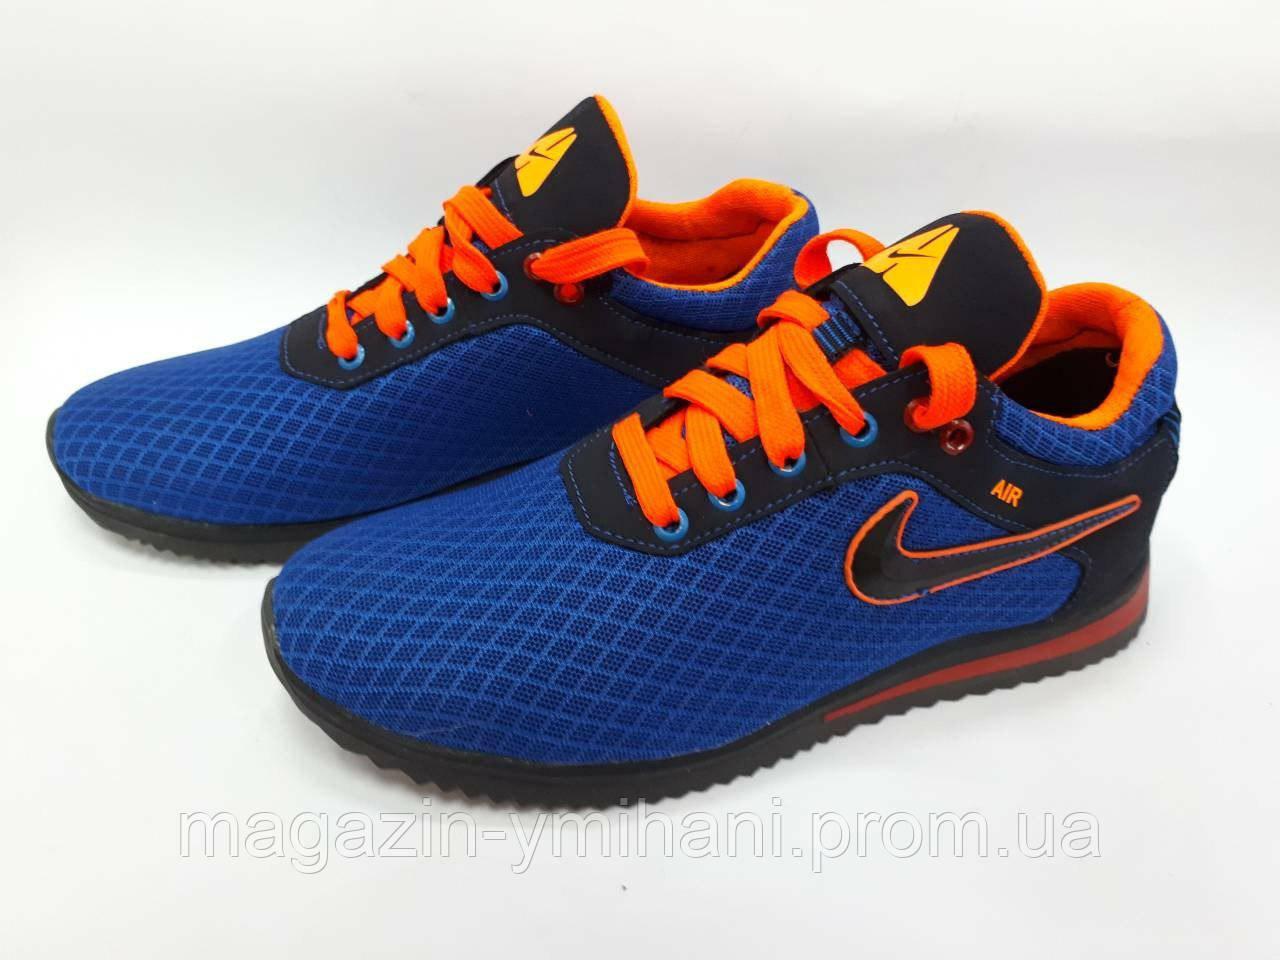 84651c7ddd5f02 Подростковые летние кроссовки Nike. Украина: продажа, цена в ...